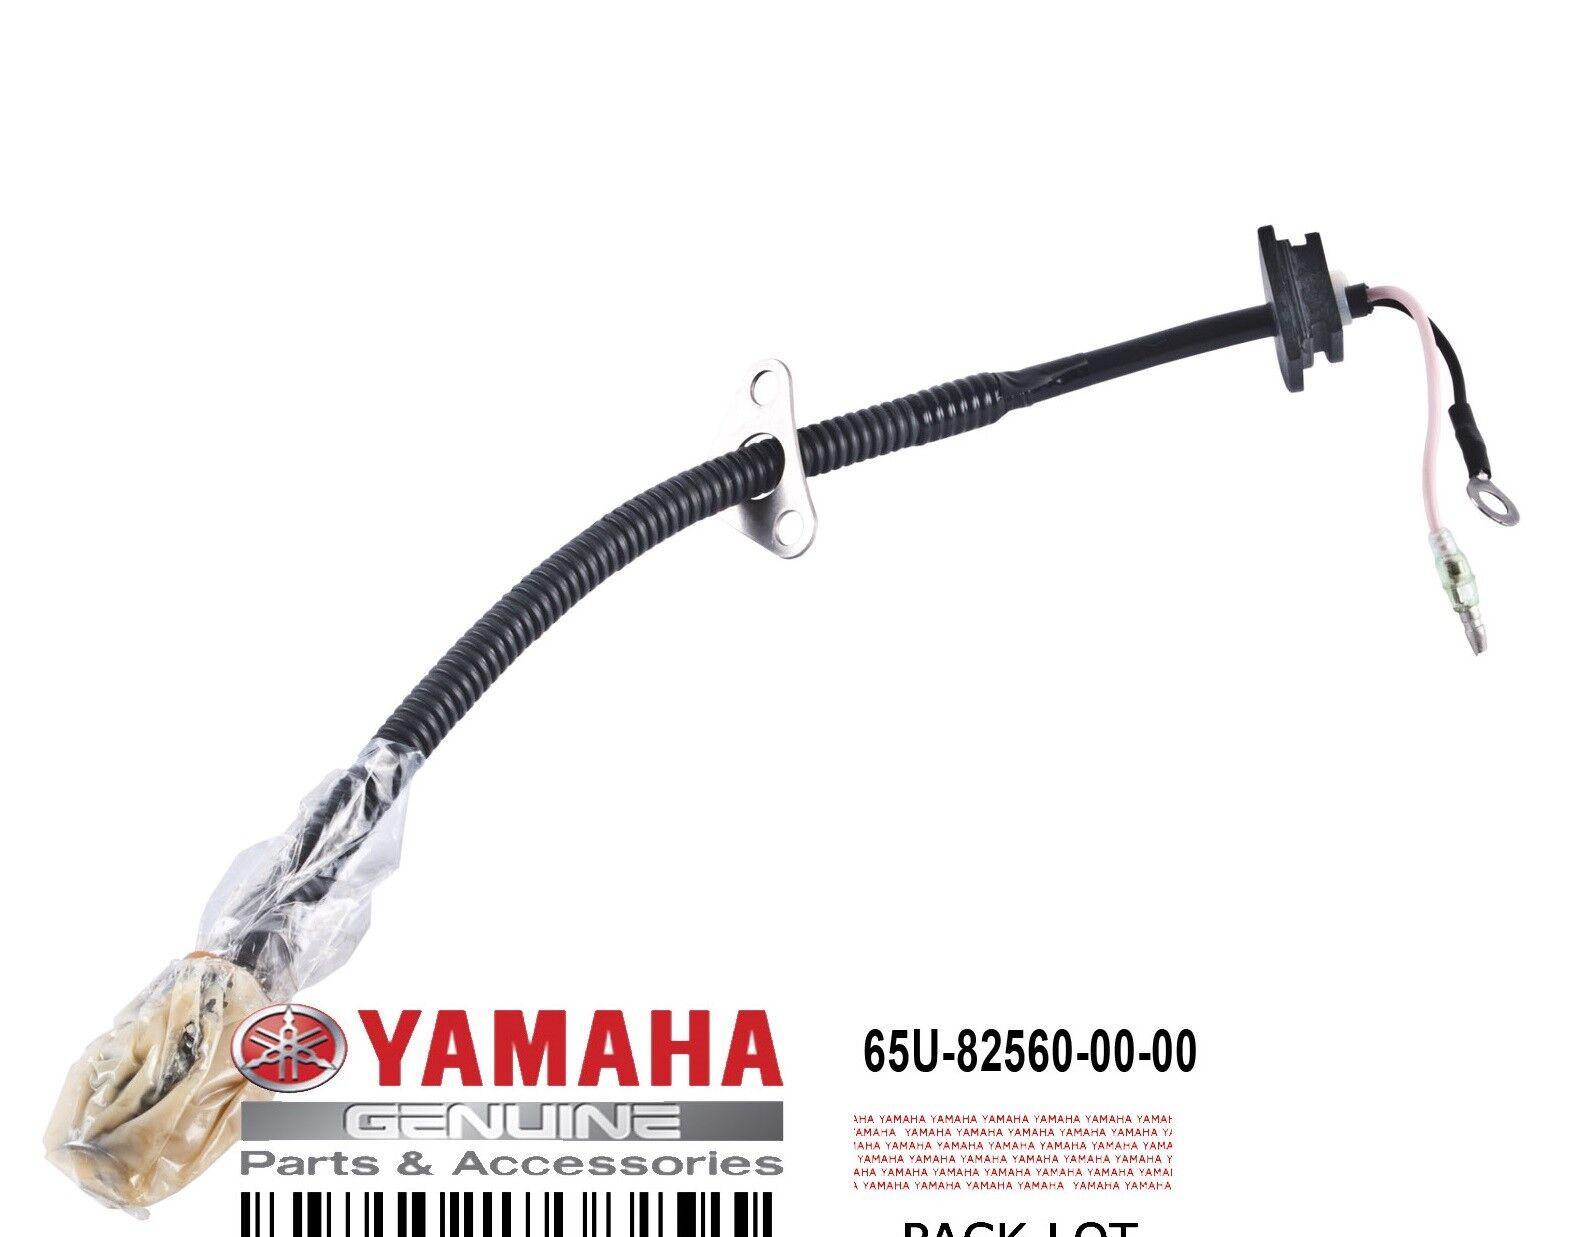 SENSOR TEMPERATURE YAMAHA 65U-82560-00 THERMO SWITCH ASSY GP XL SUV 1200